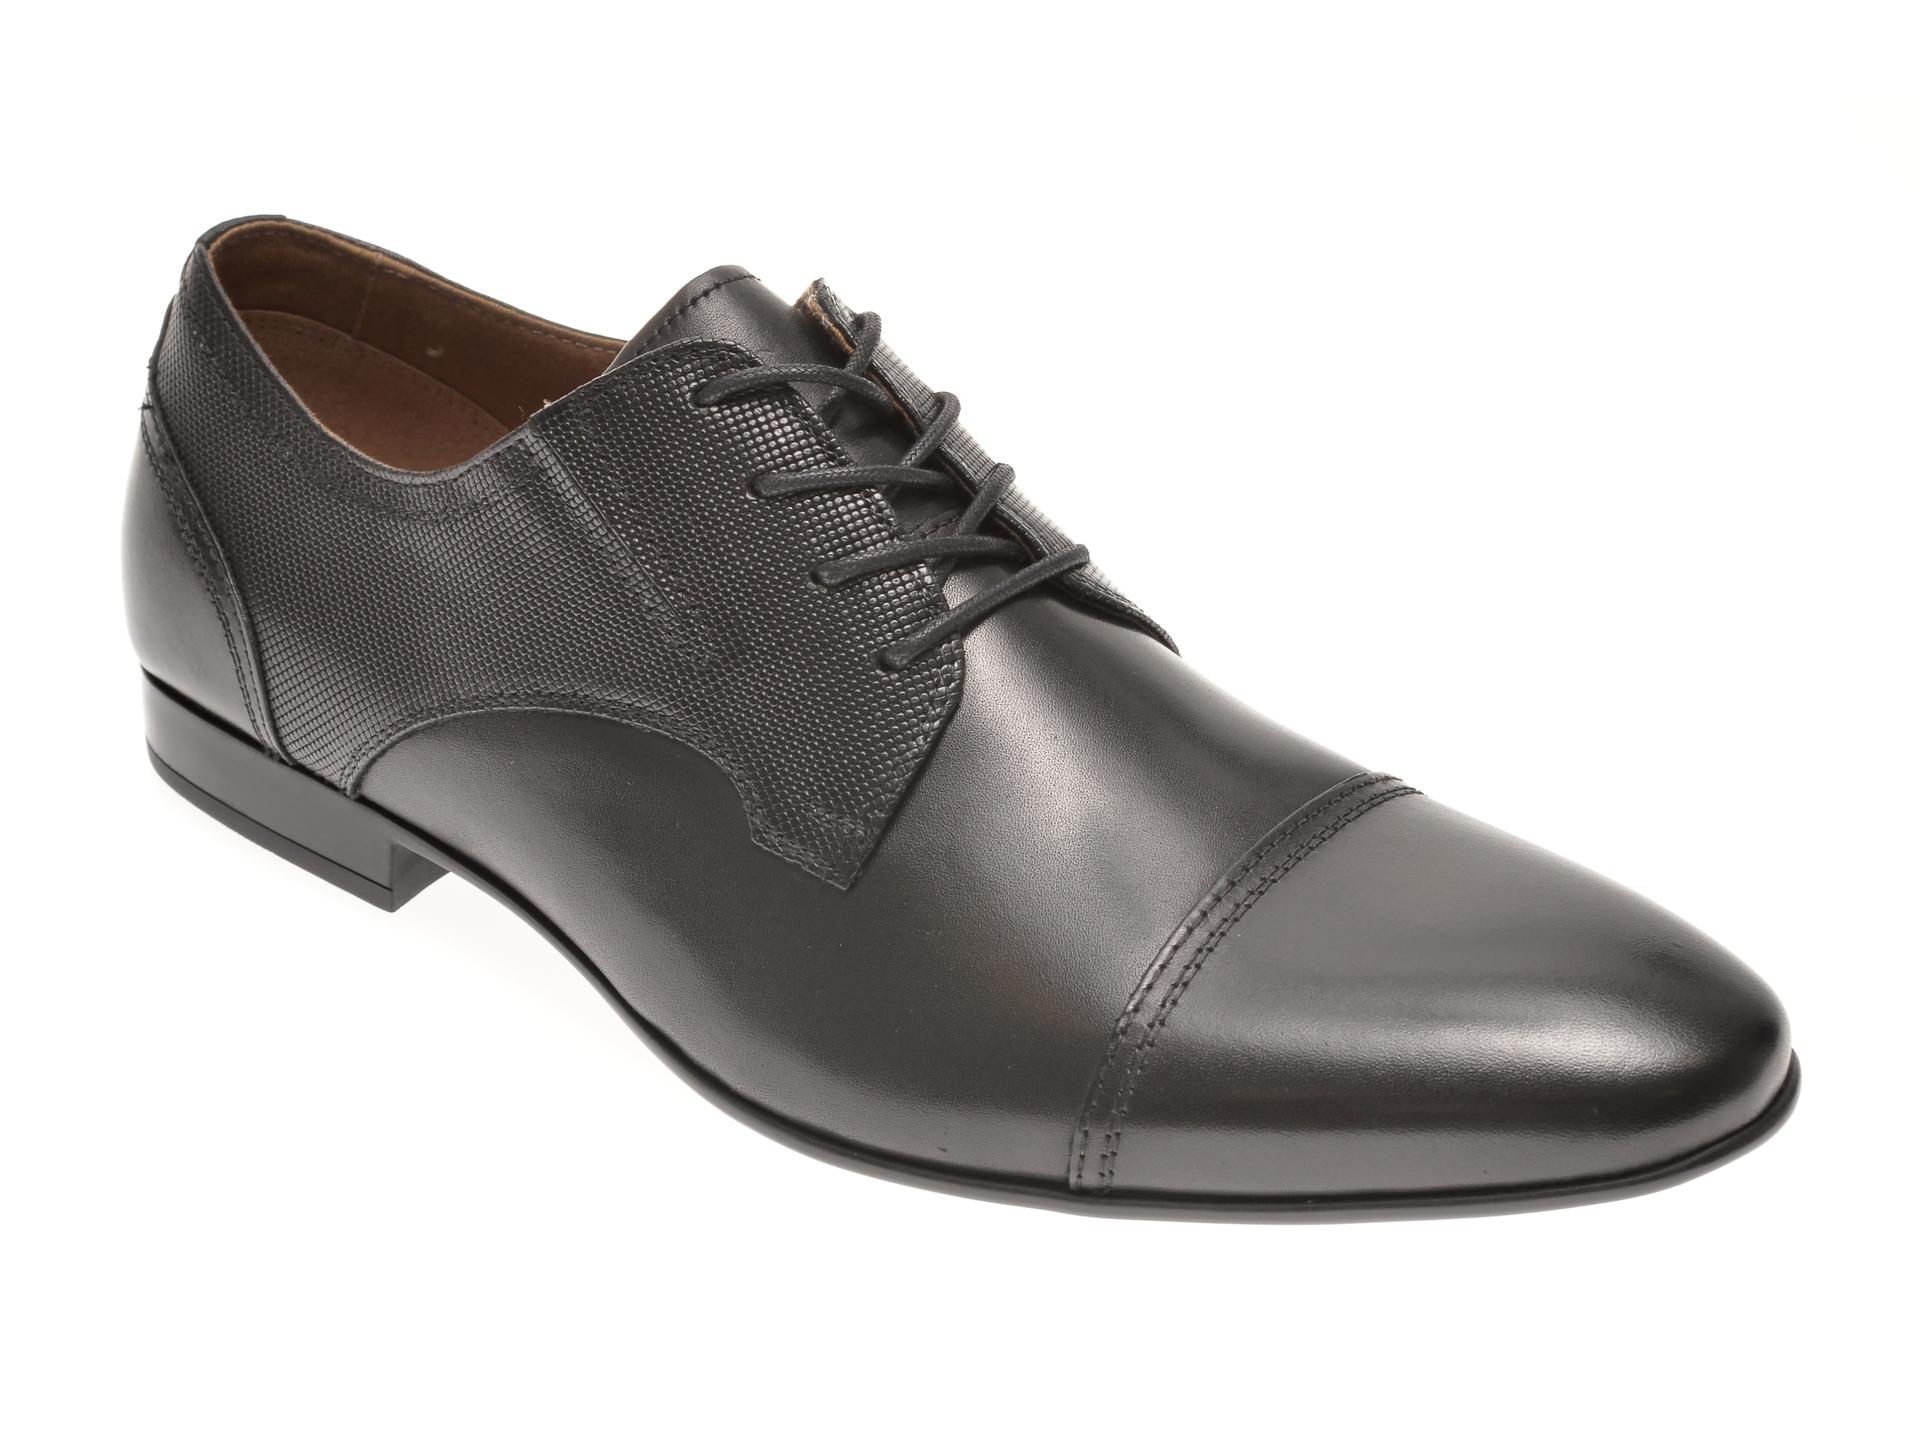 Pantofi ALDO negri, Neustetten001, din piele naturala imagine otter.ro 2021